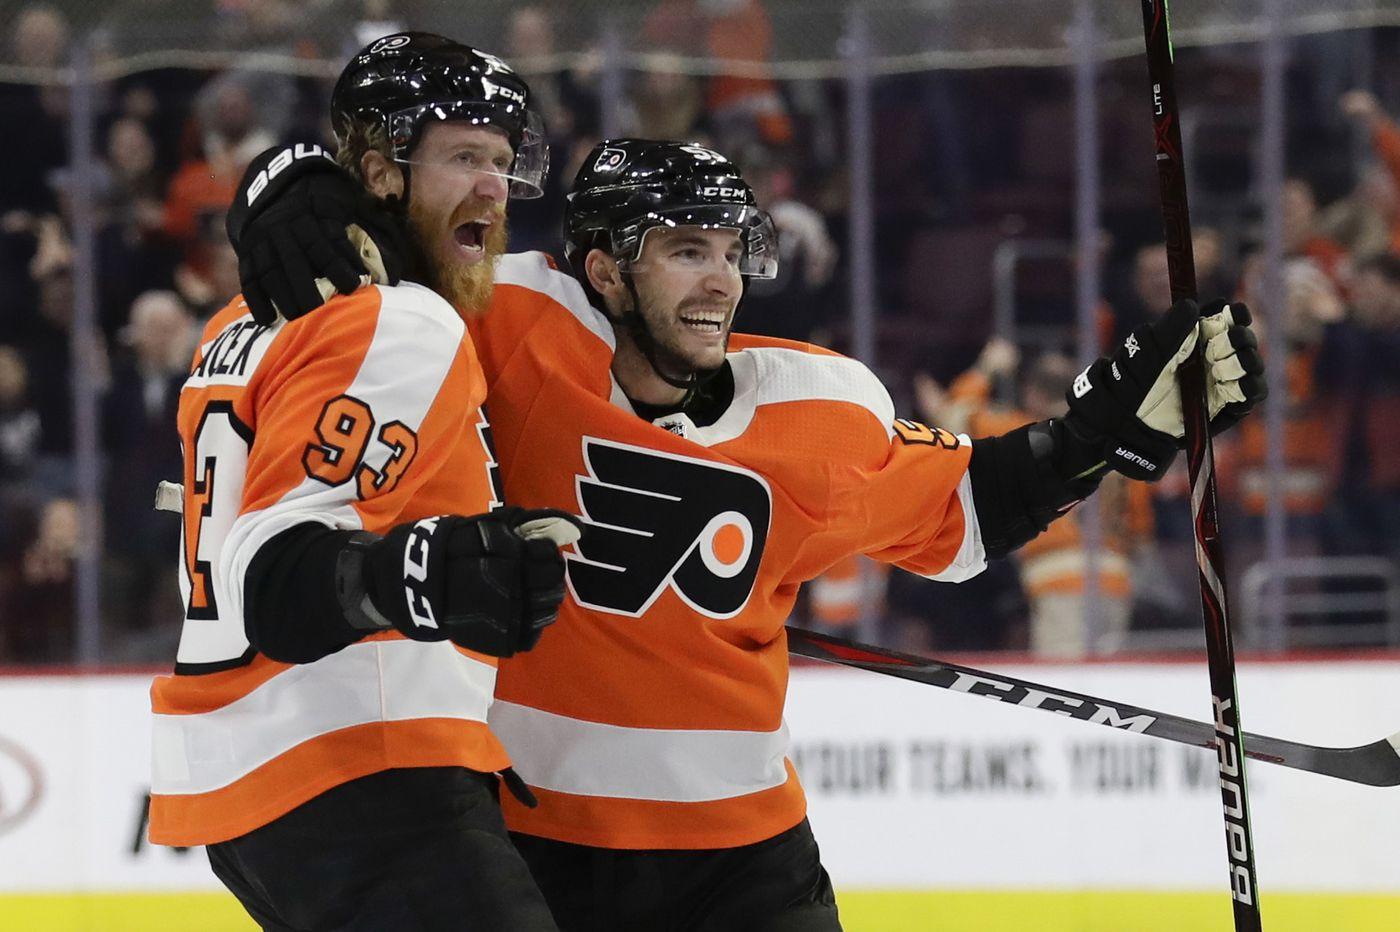 If Johnny Boychuk plays in rematch against Jake Voracek, Flyers' interim coach Scott Gordon doesn't expect fireworks